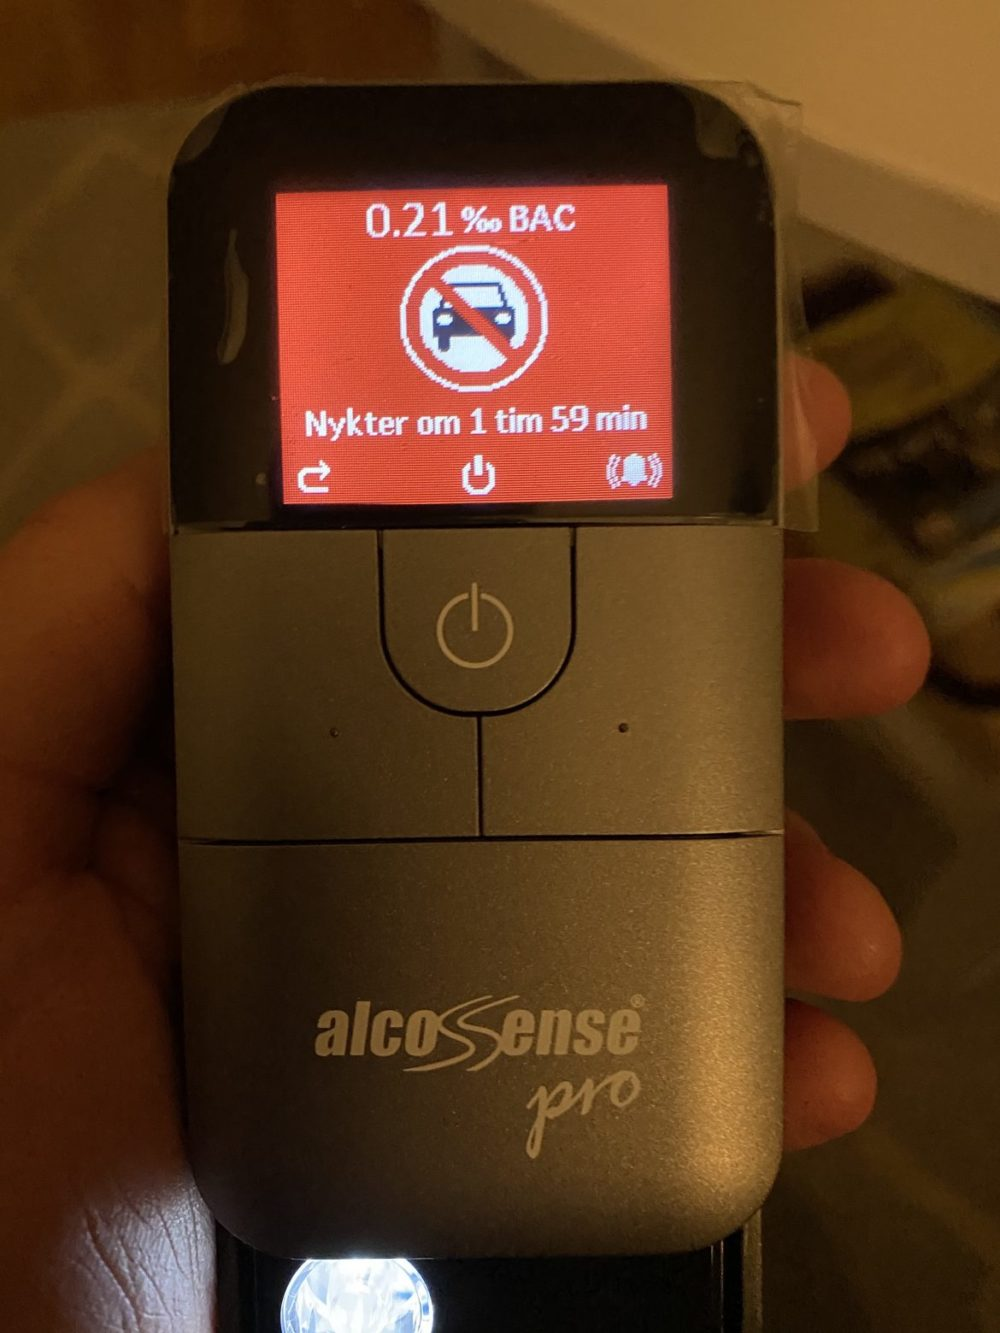 AlcoSense Pro test recension 0.2 promille senses